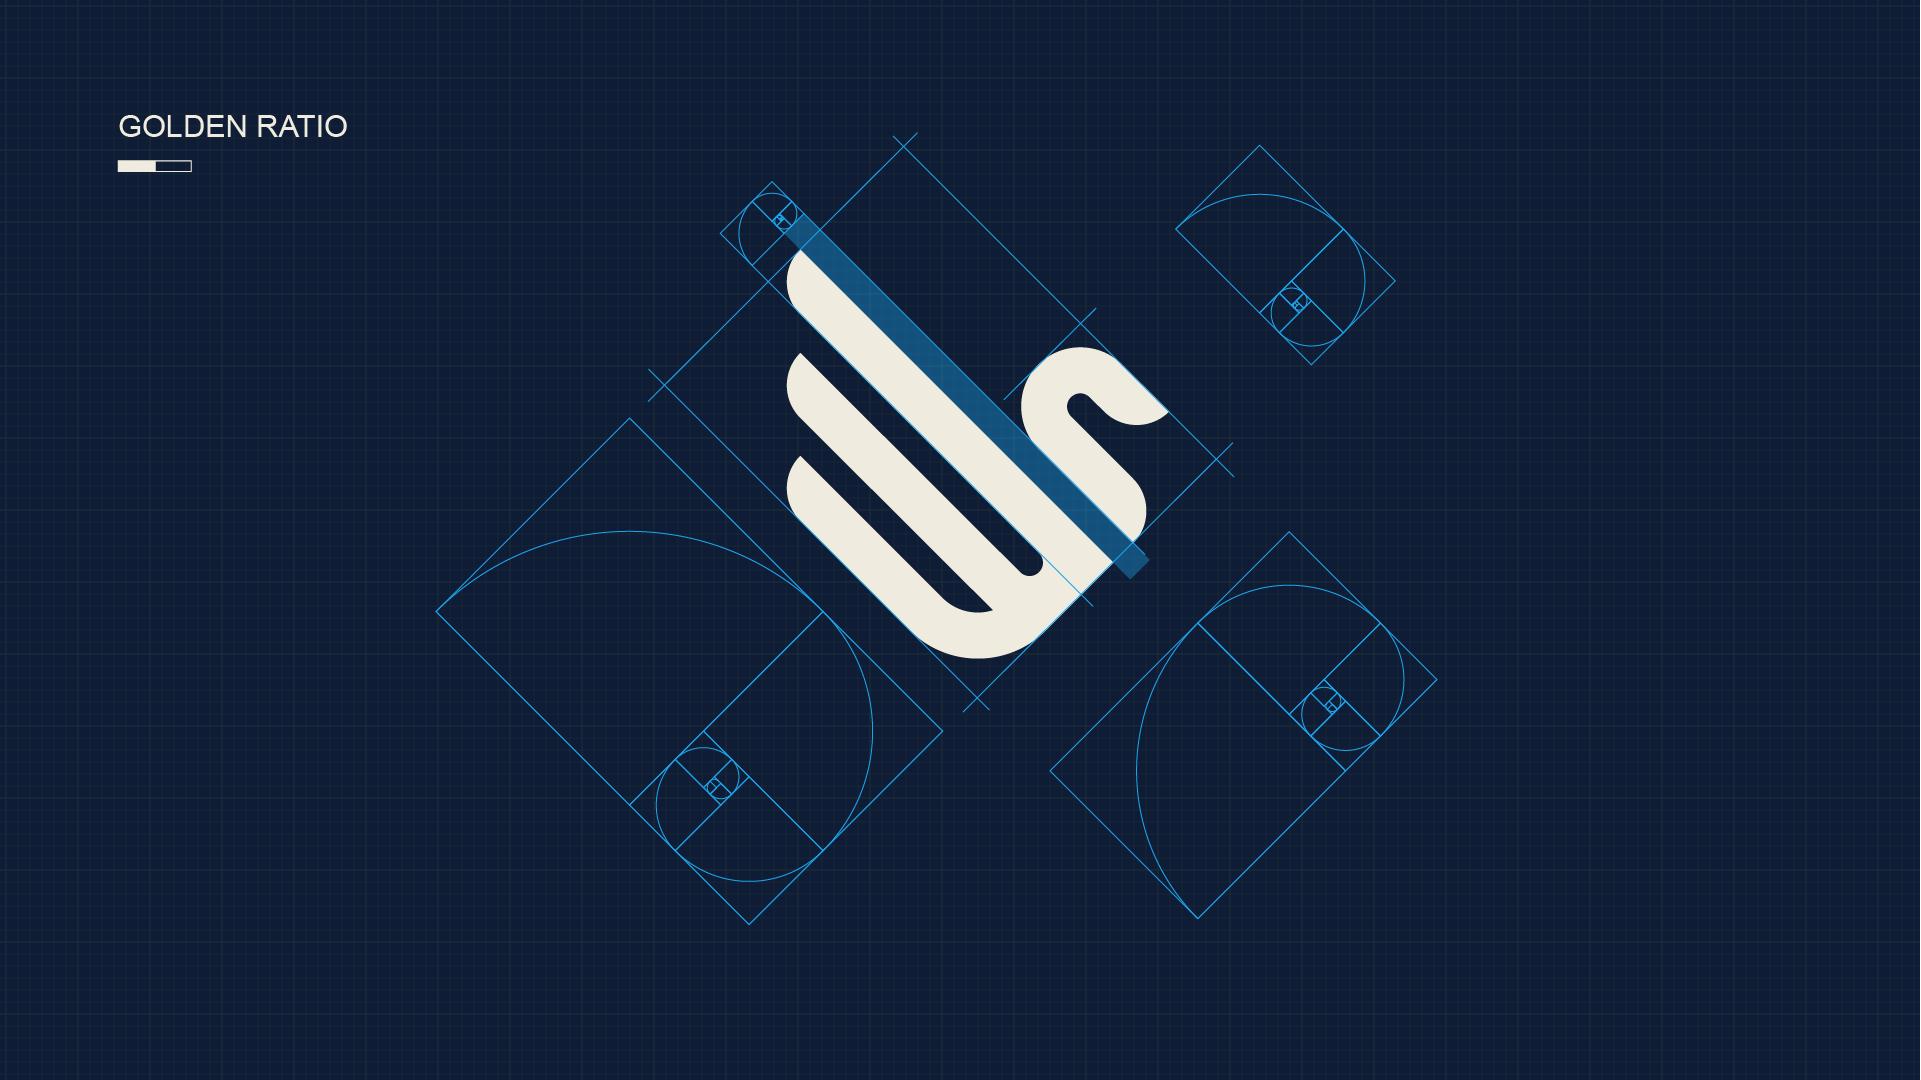 logo设计黄金比例制图